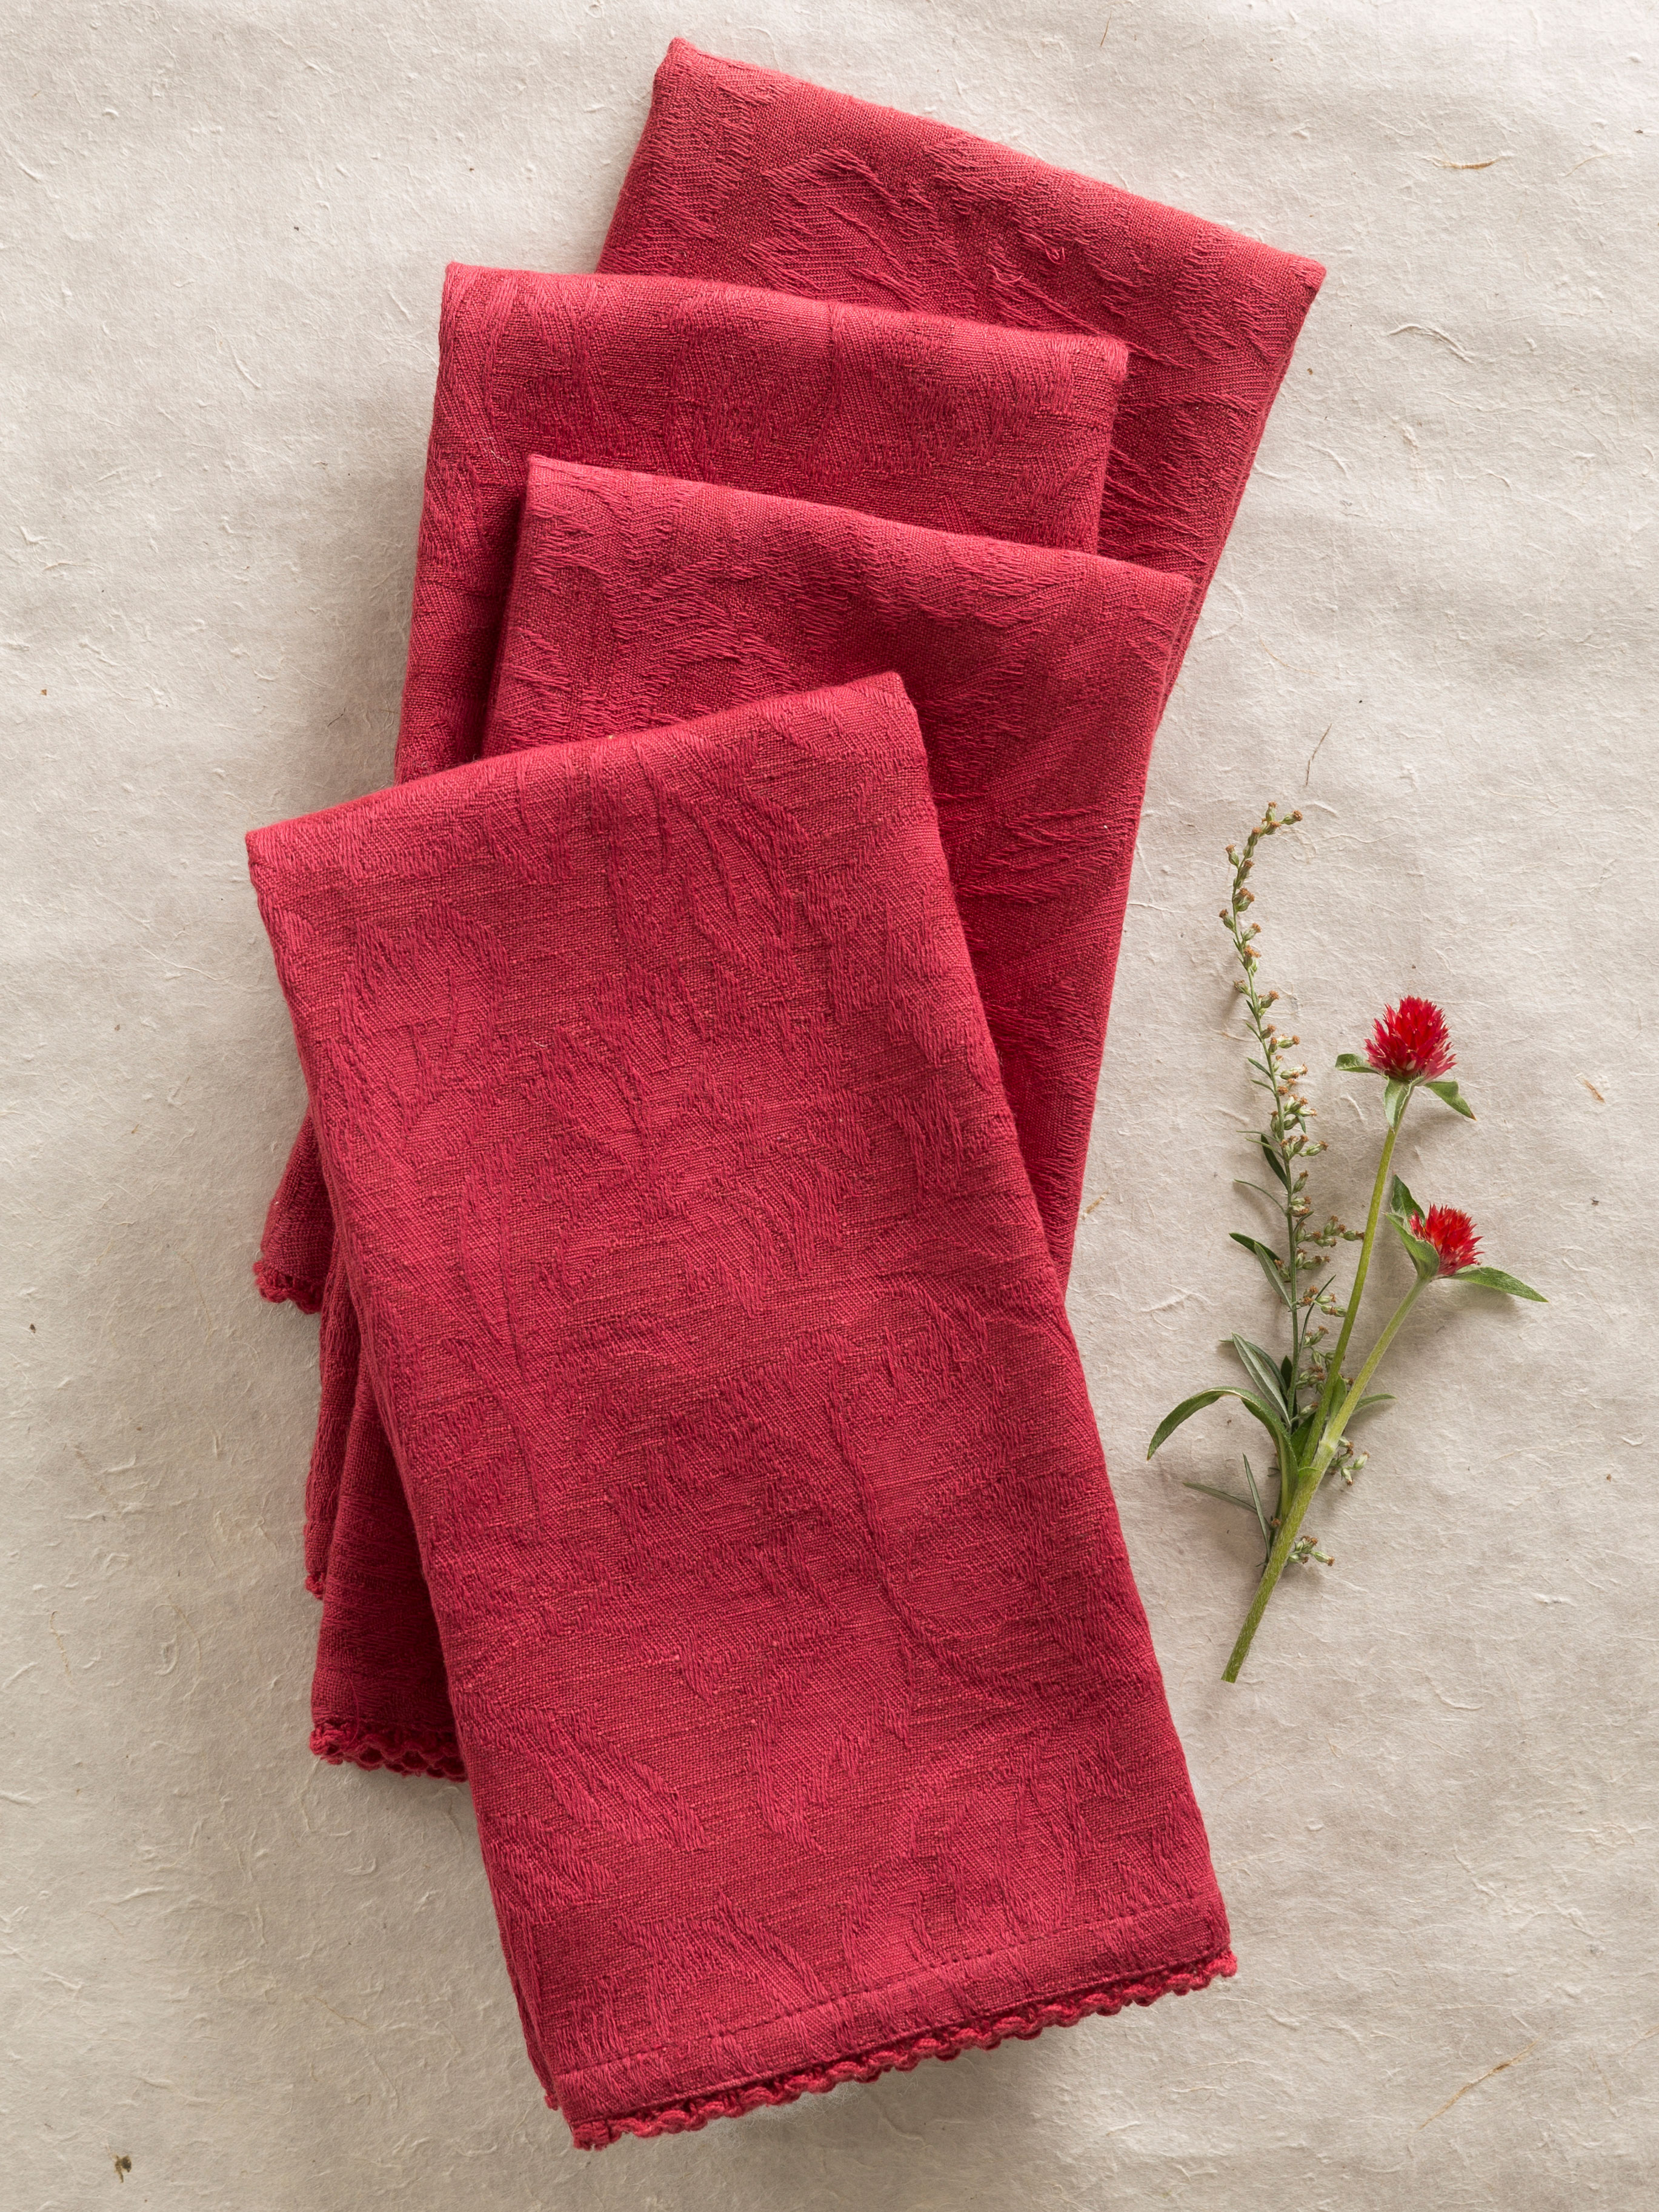 Luxurious Linen Jacquard Napkin Set of 4 - Cranberry